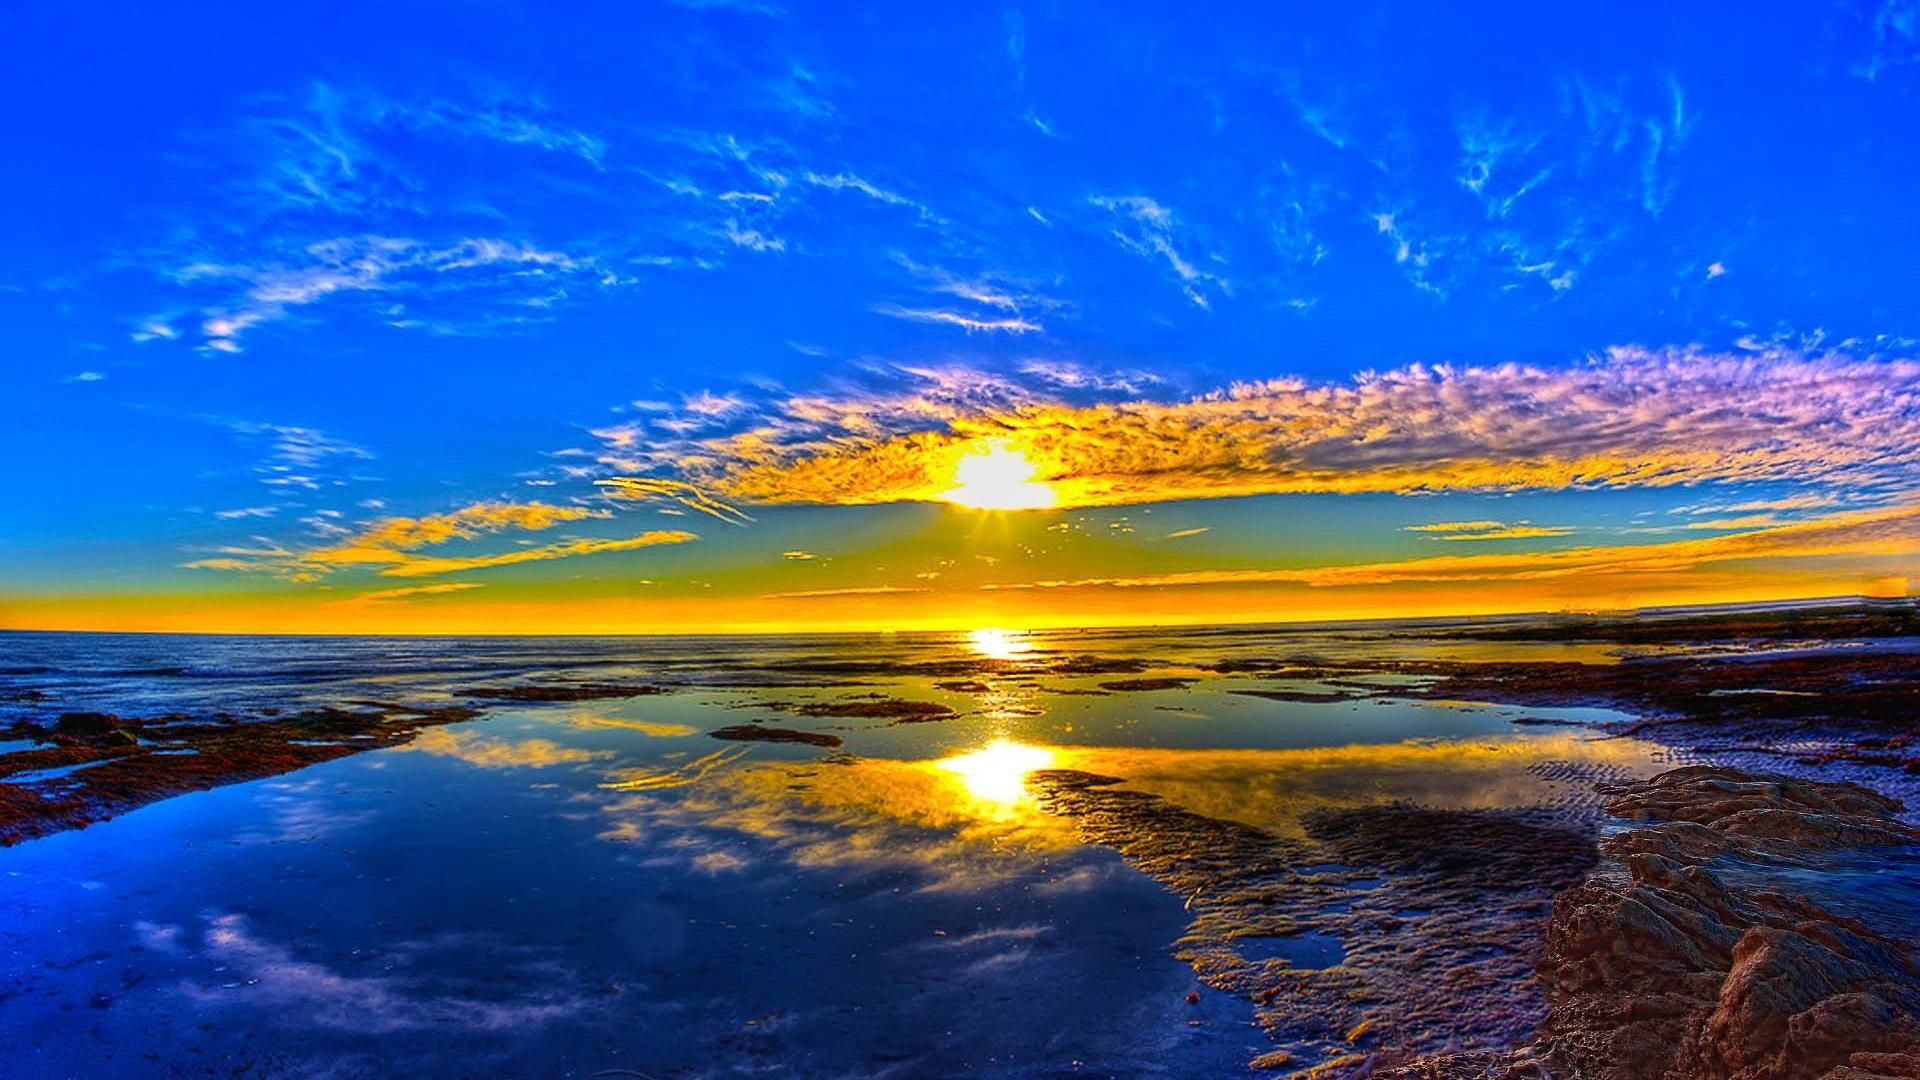 Sunrise Wallpaper; Sunrise Wallpaper; Sunrise Wallpaper ...